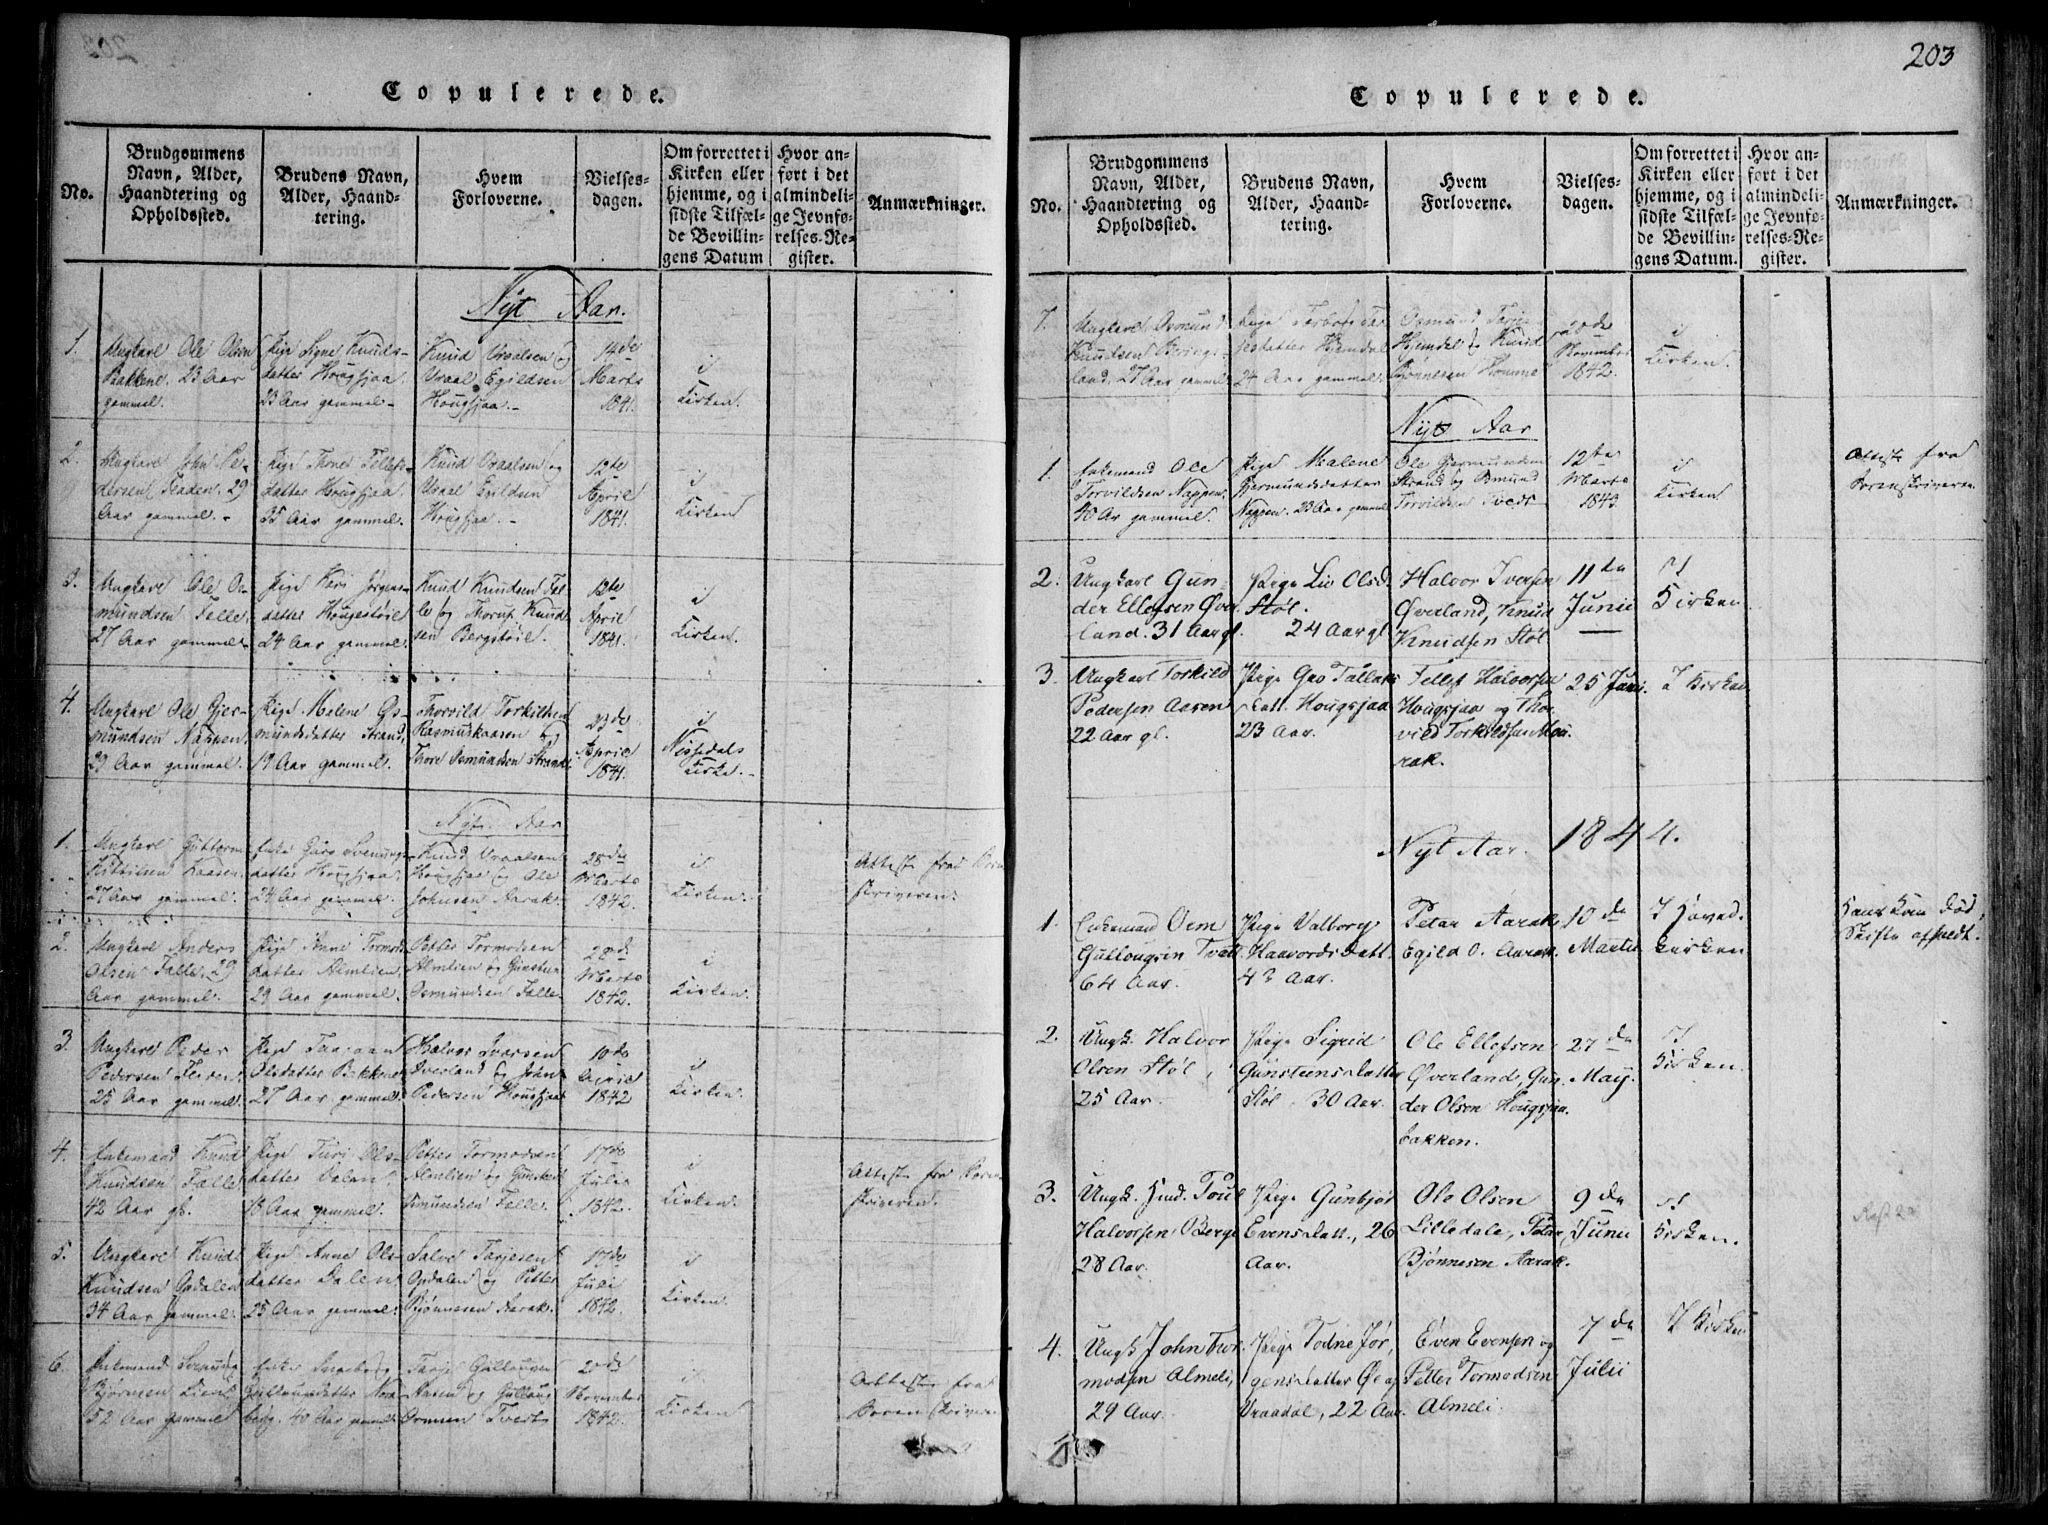 SAKO, Nissedal kirkebøker, F/Fb/L0001: Ministerialbok nr. II 1, 1814-1845, s. 203